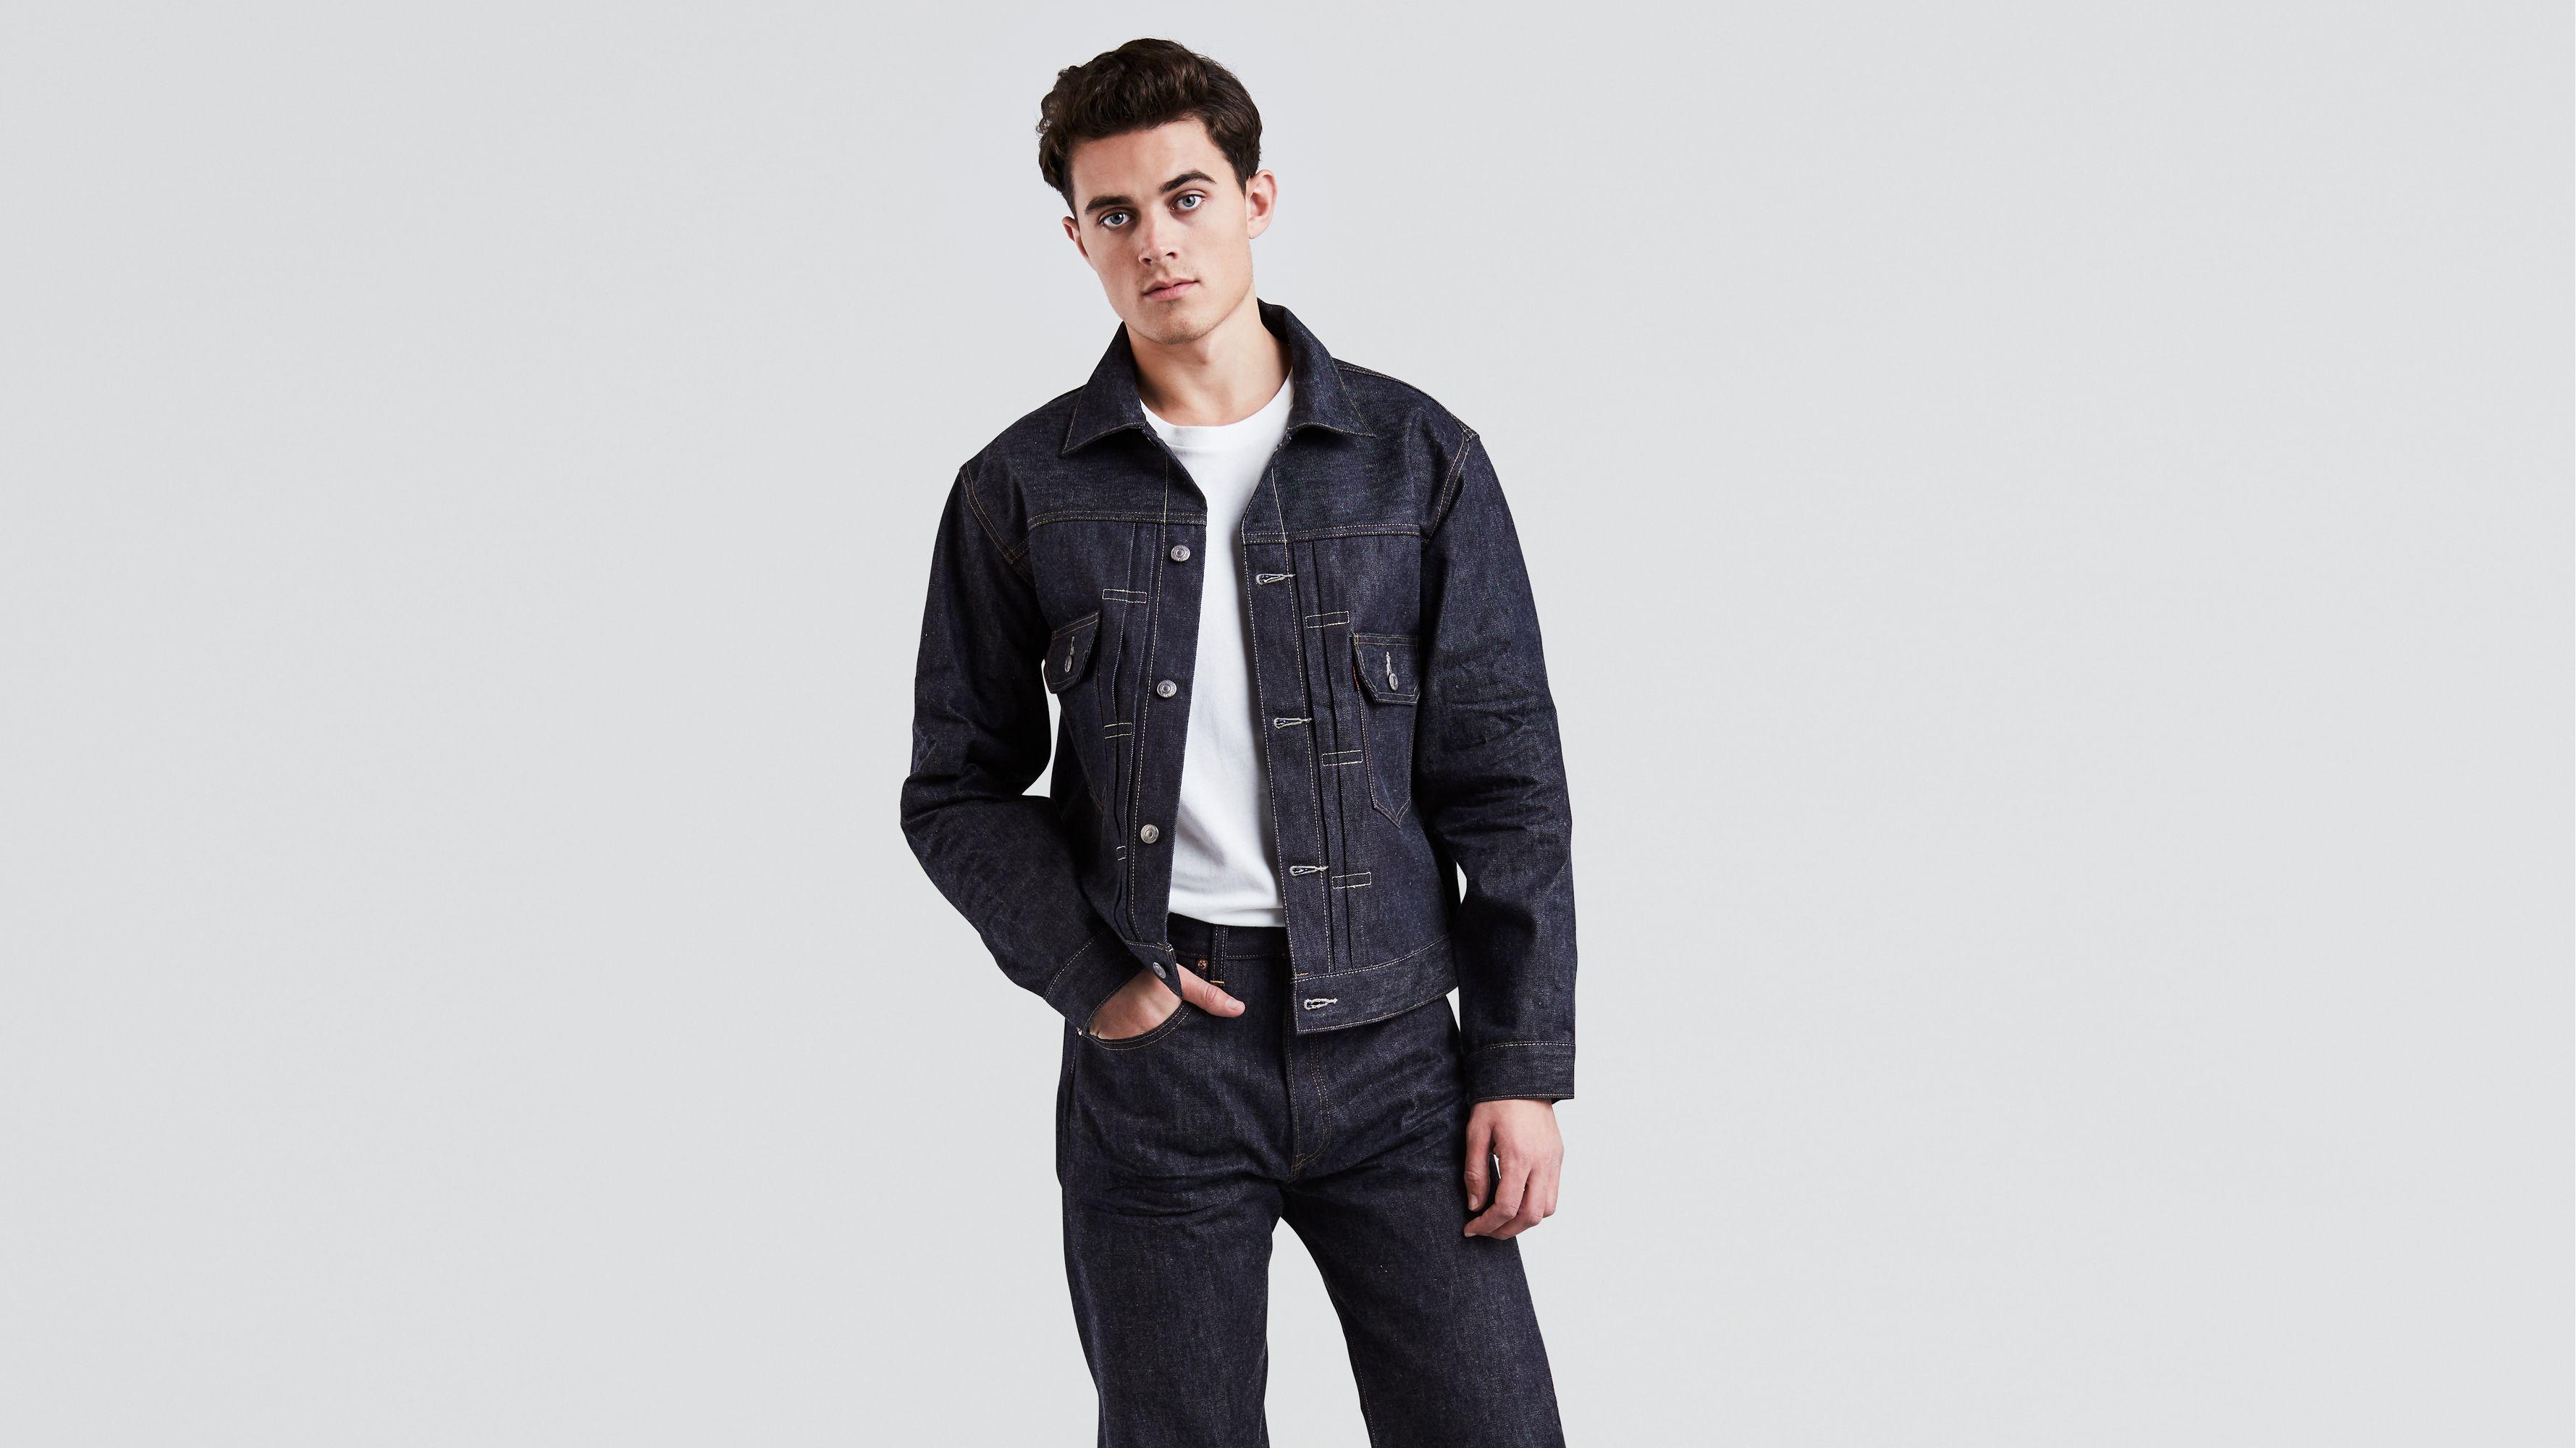 Vintage Clothing Levis Men's Levi's® Es Colecciones SqHw5xwUO